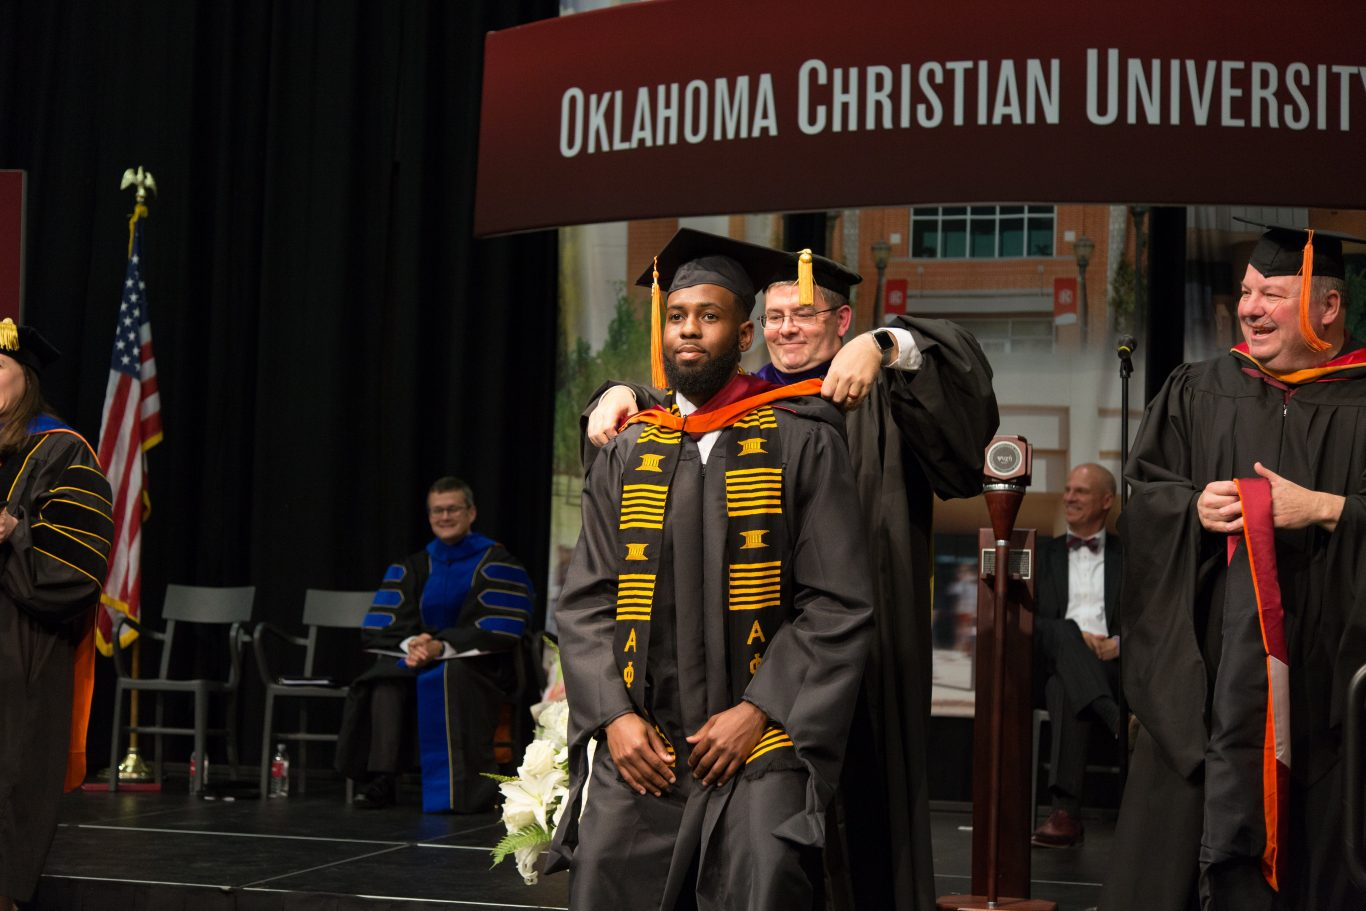 Graduate student graduating